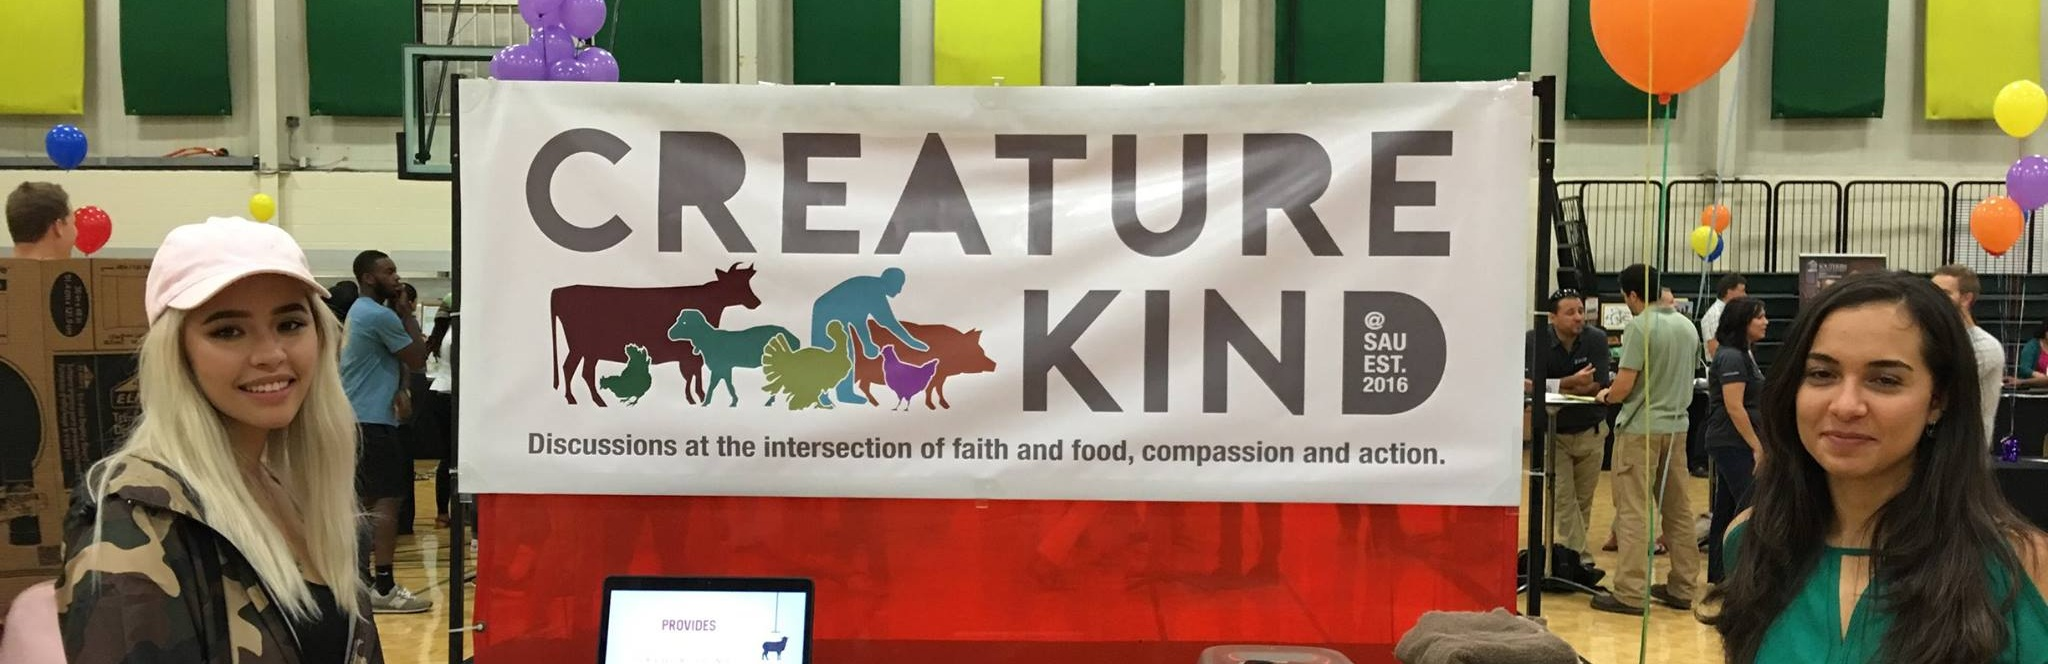 CreatureKind at Southern Adventist University, 2016